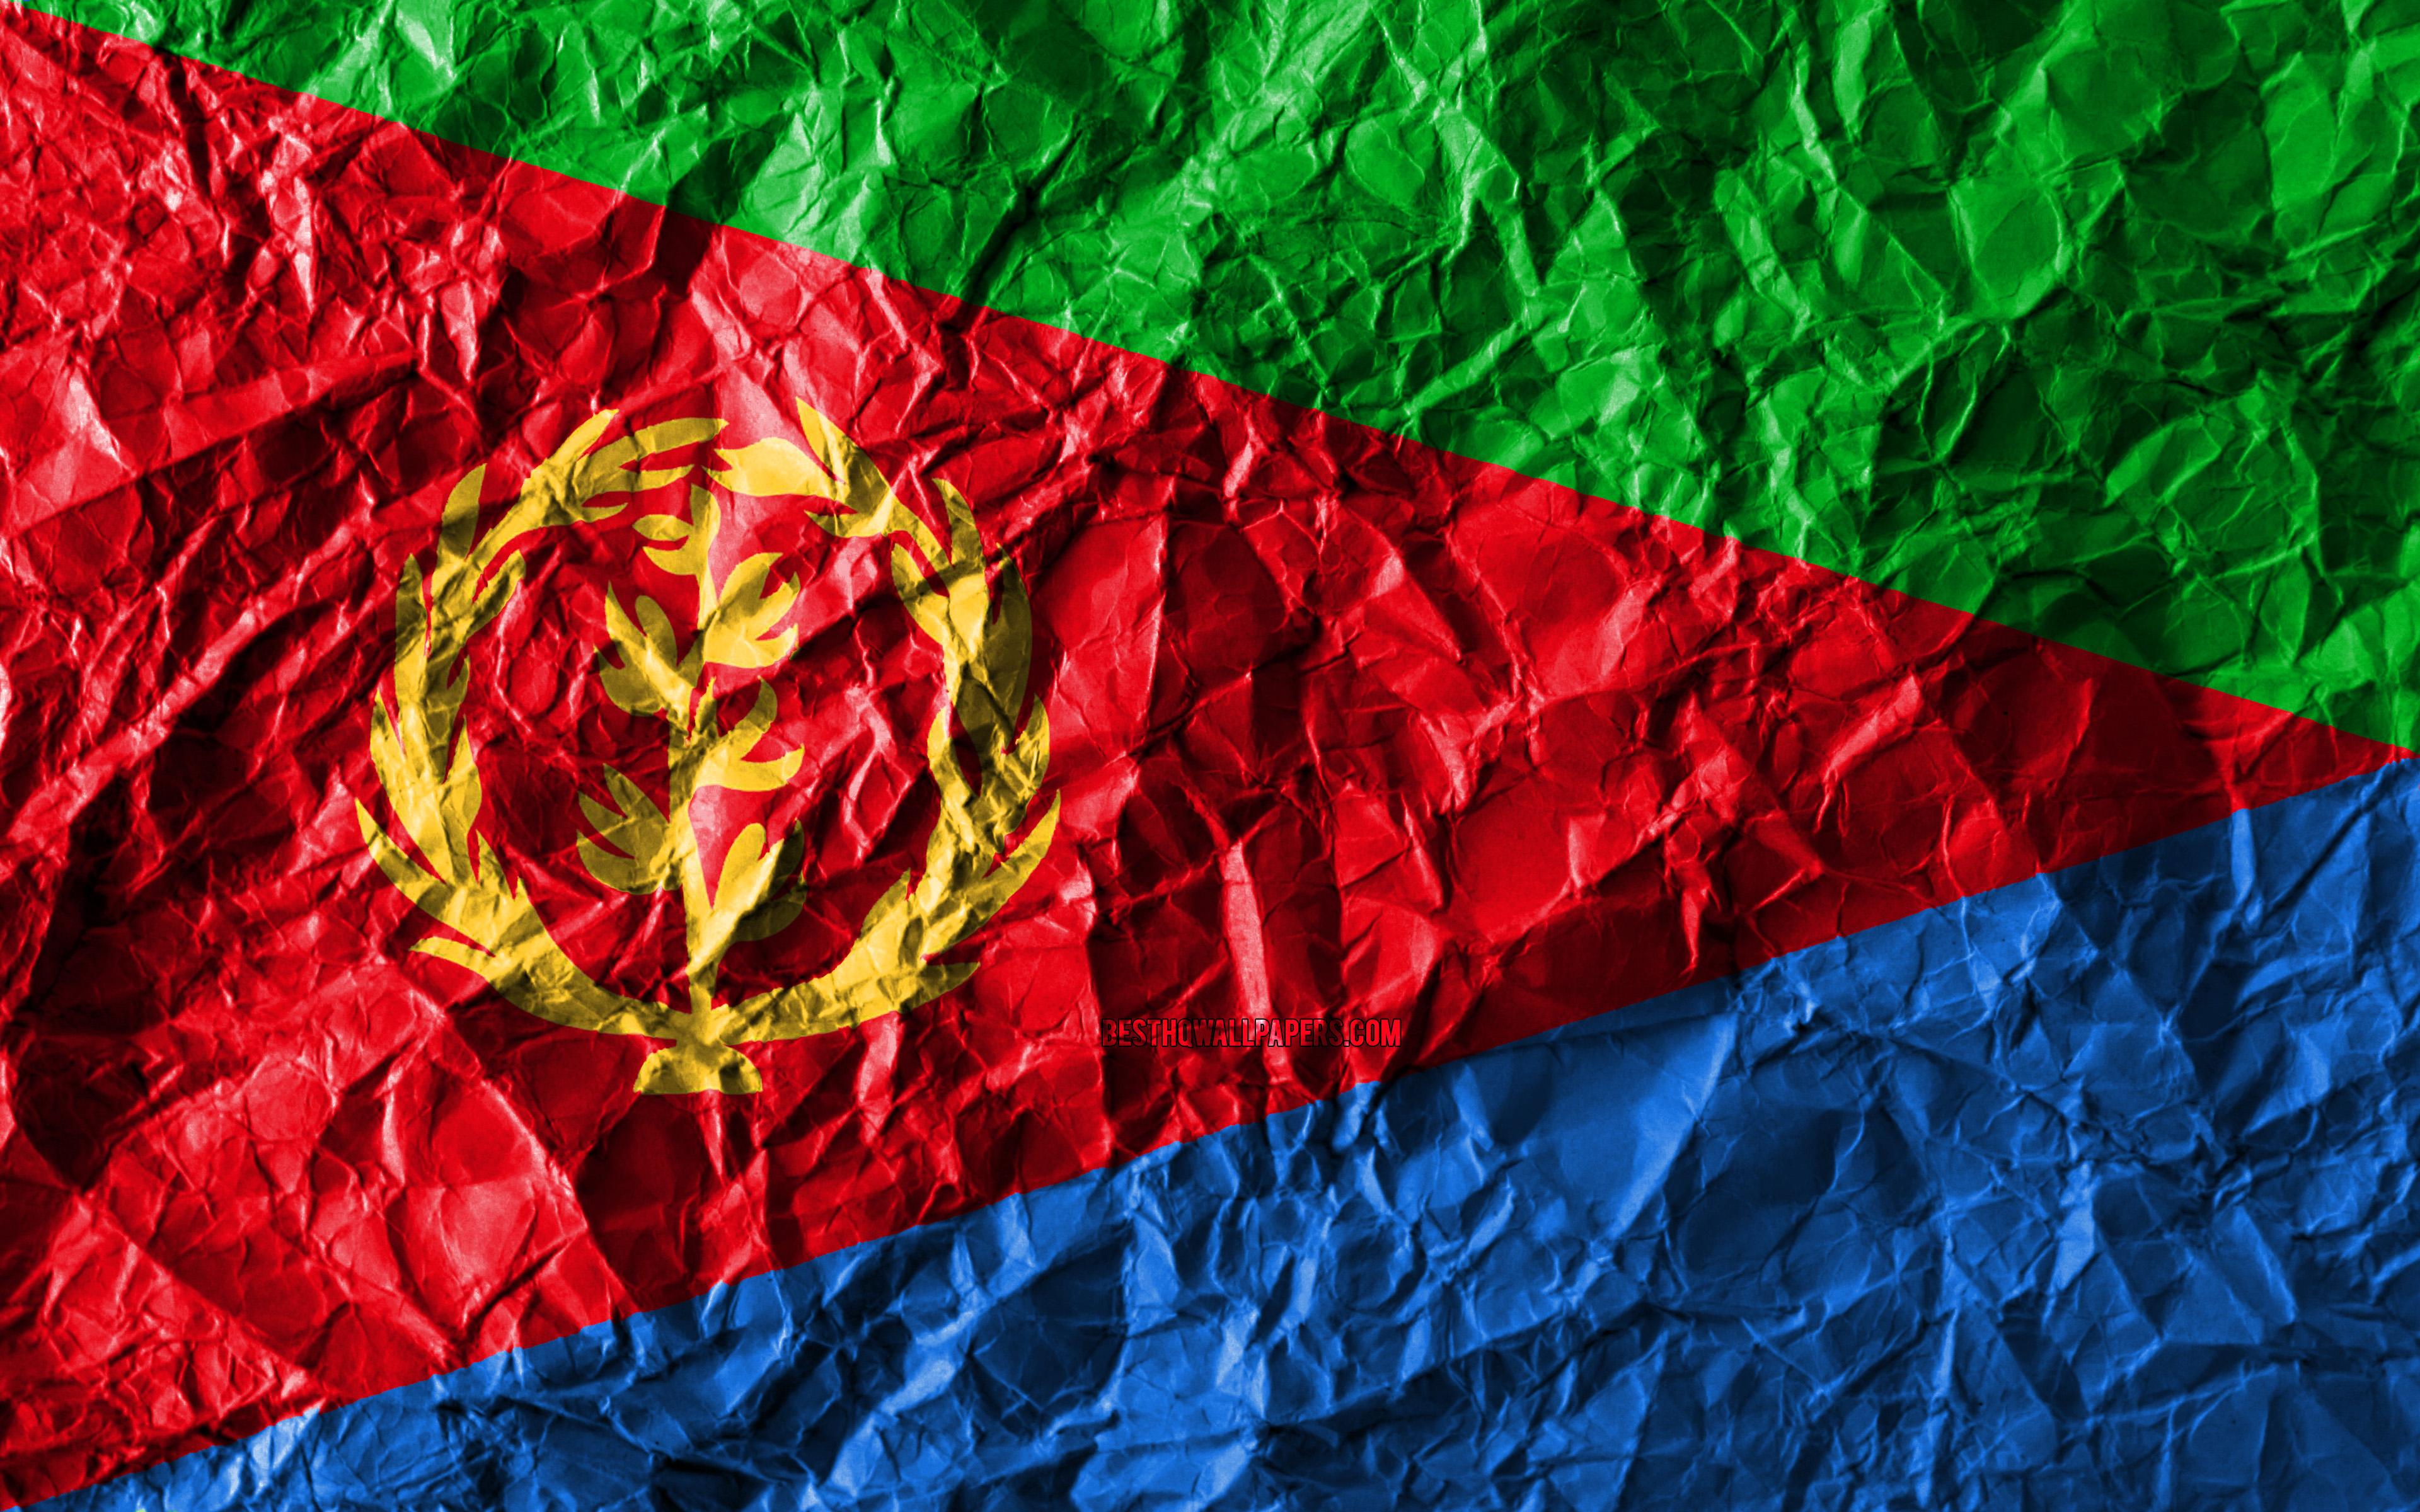 Download wallpapers Eritrean flag 4k crumpled paper African 3840x2400